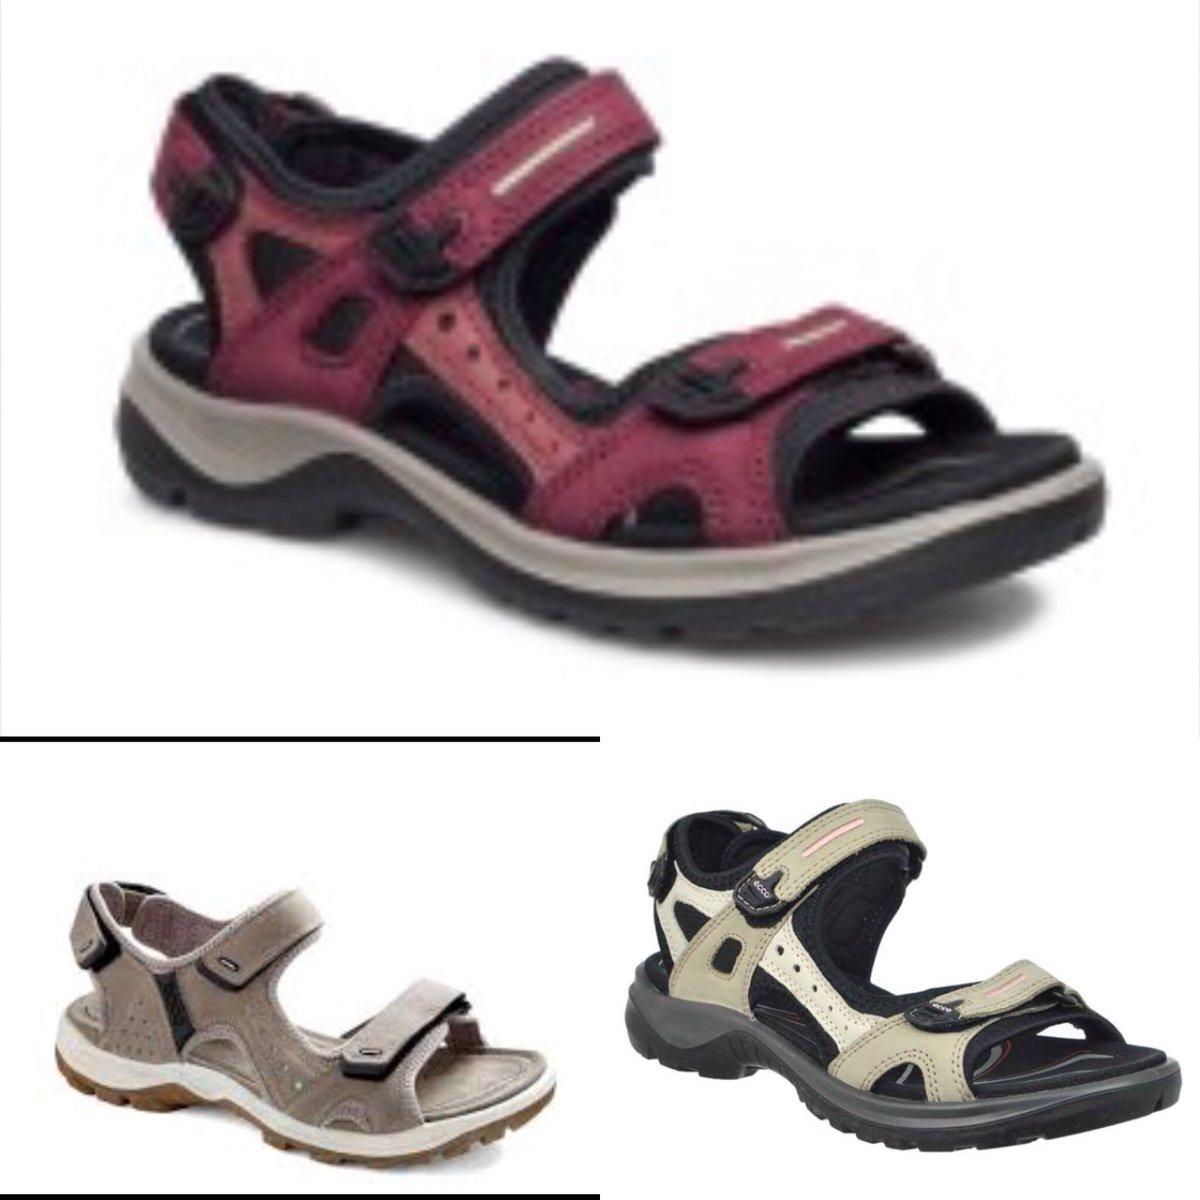 Details about Ecco RXP Trail Hiking Running Receptor Shoes Black Grey Men EU 39 US 8 8.5